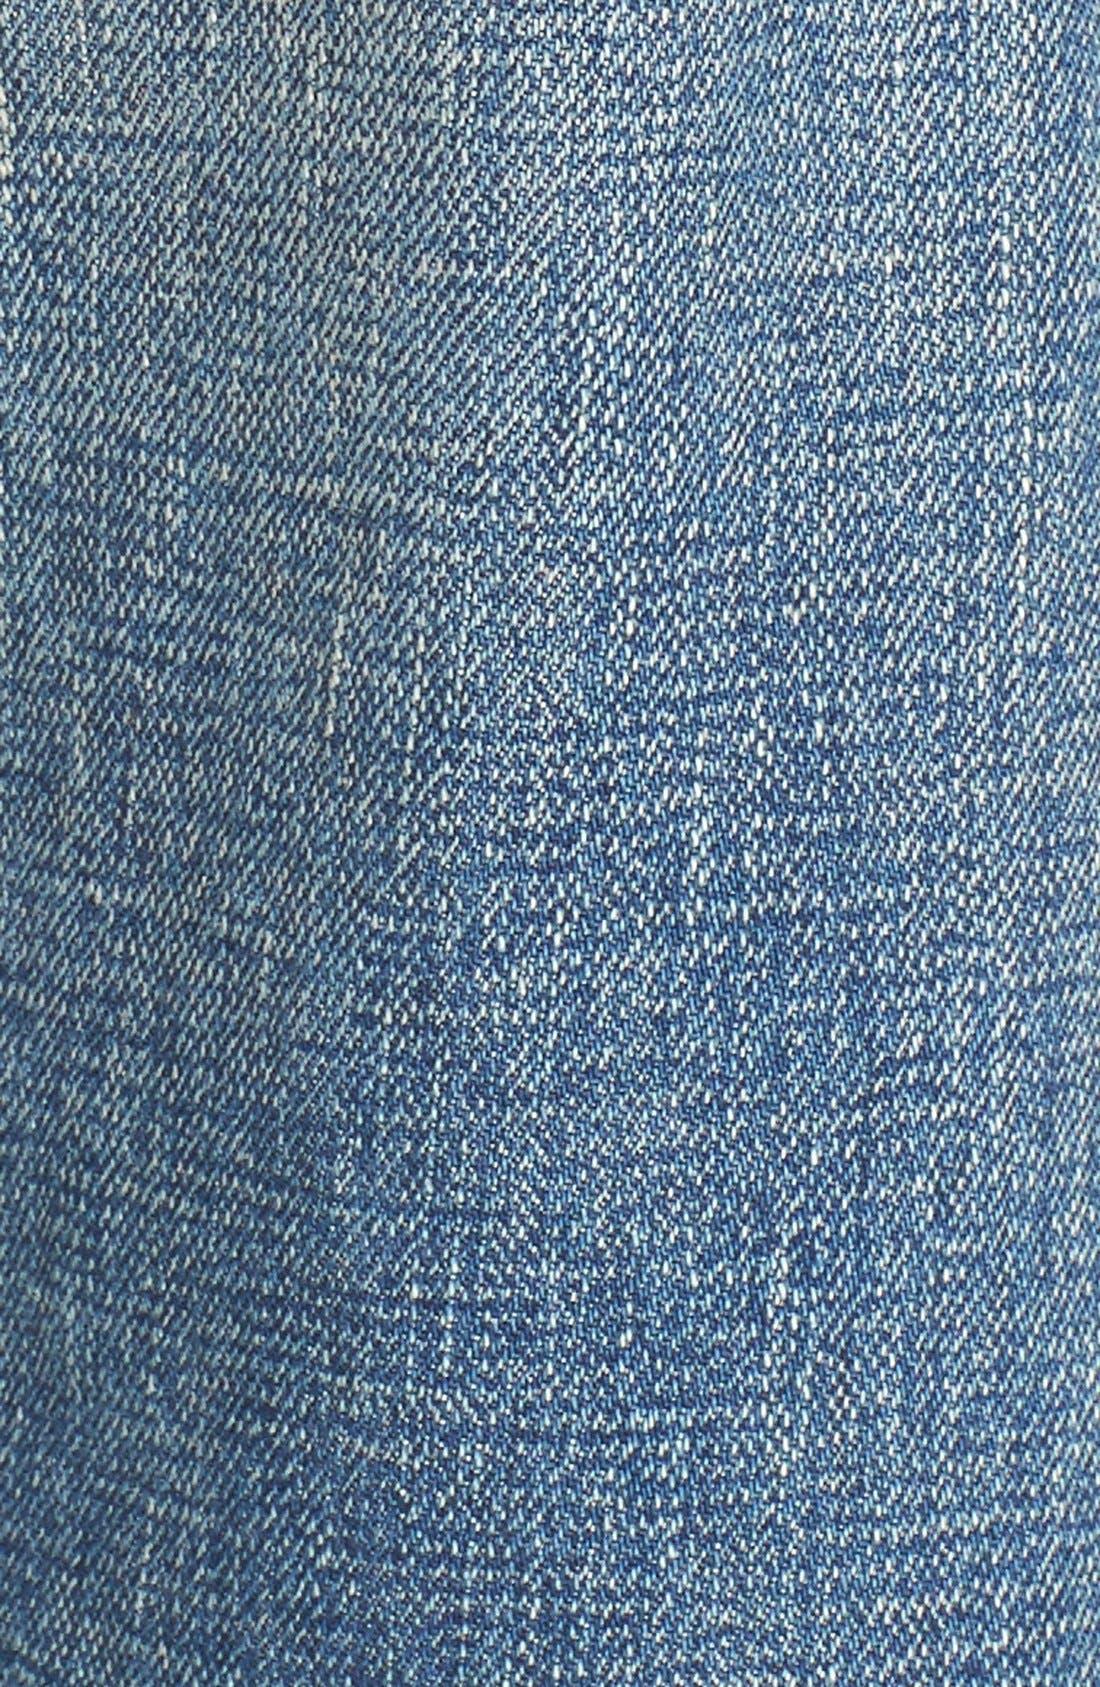 Imitation Pearl Embellished Jeans,                             Alternate thumbnail 3, color,                             101